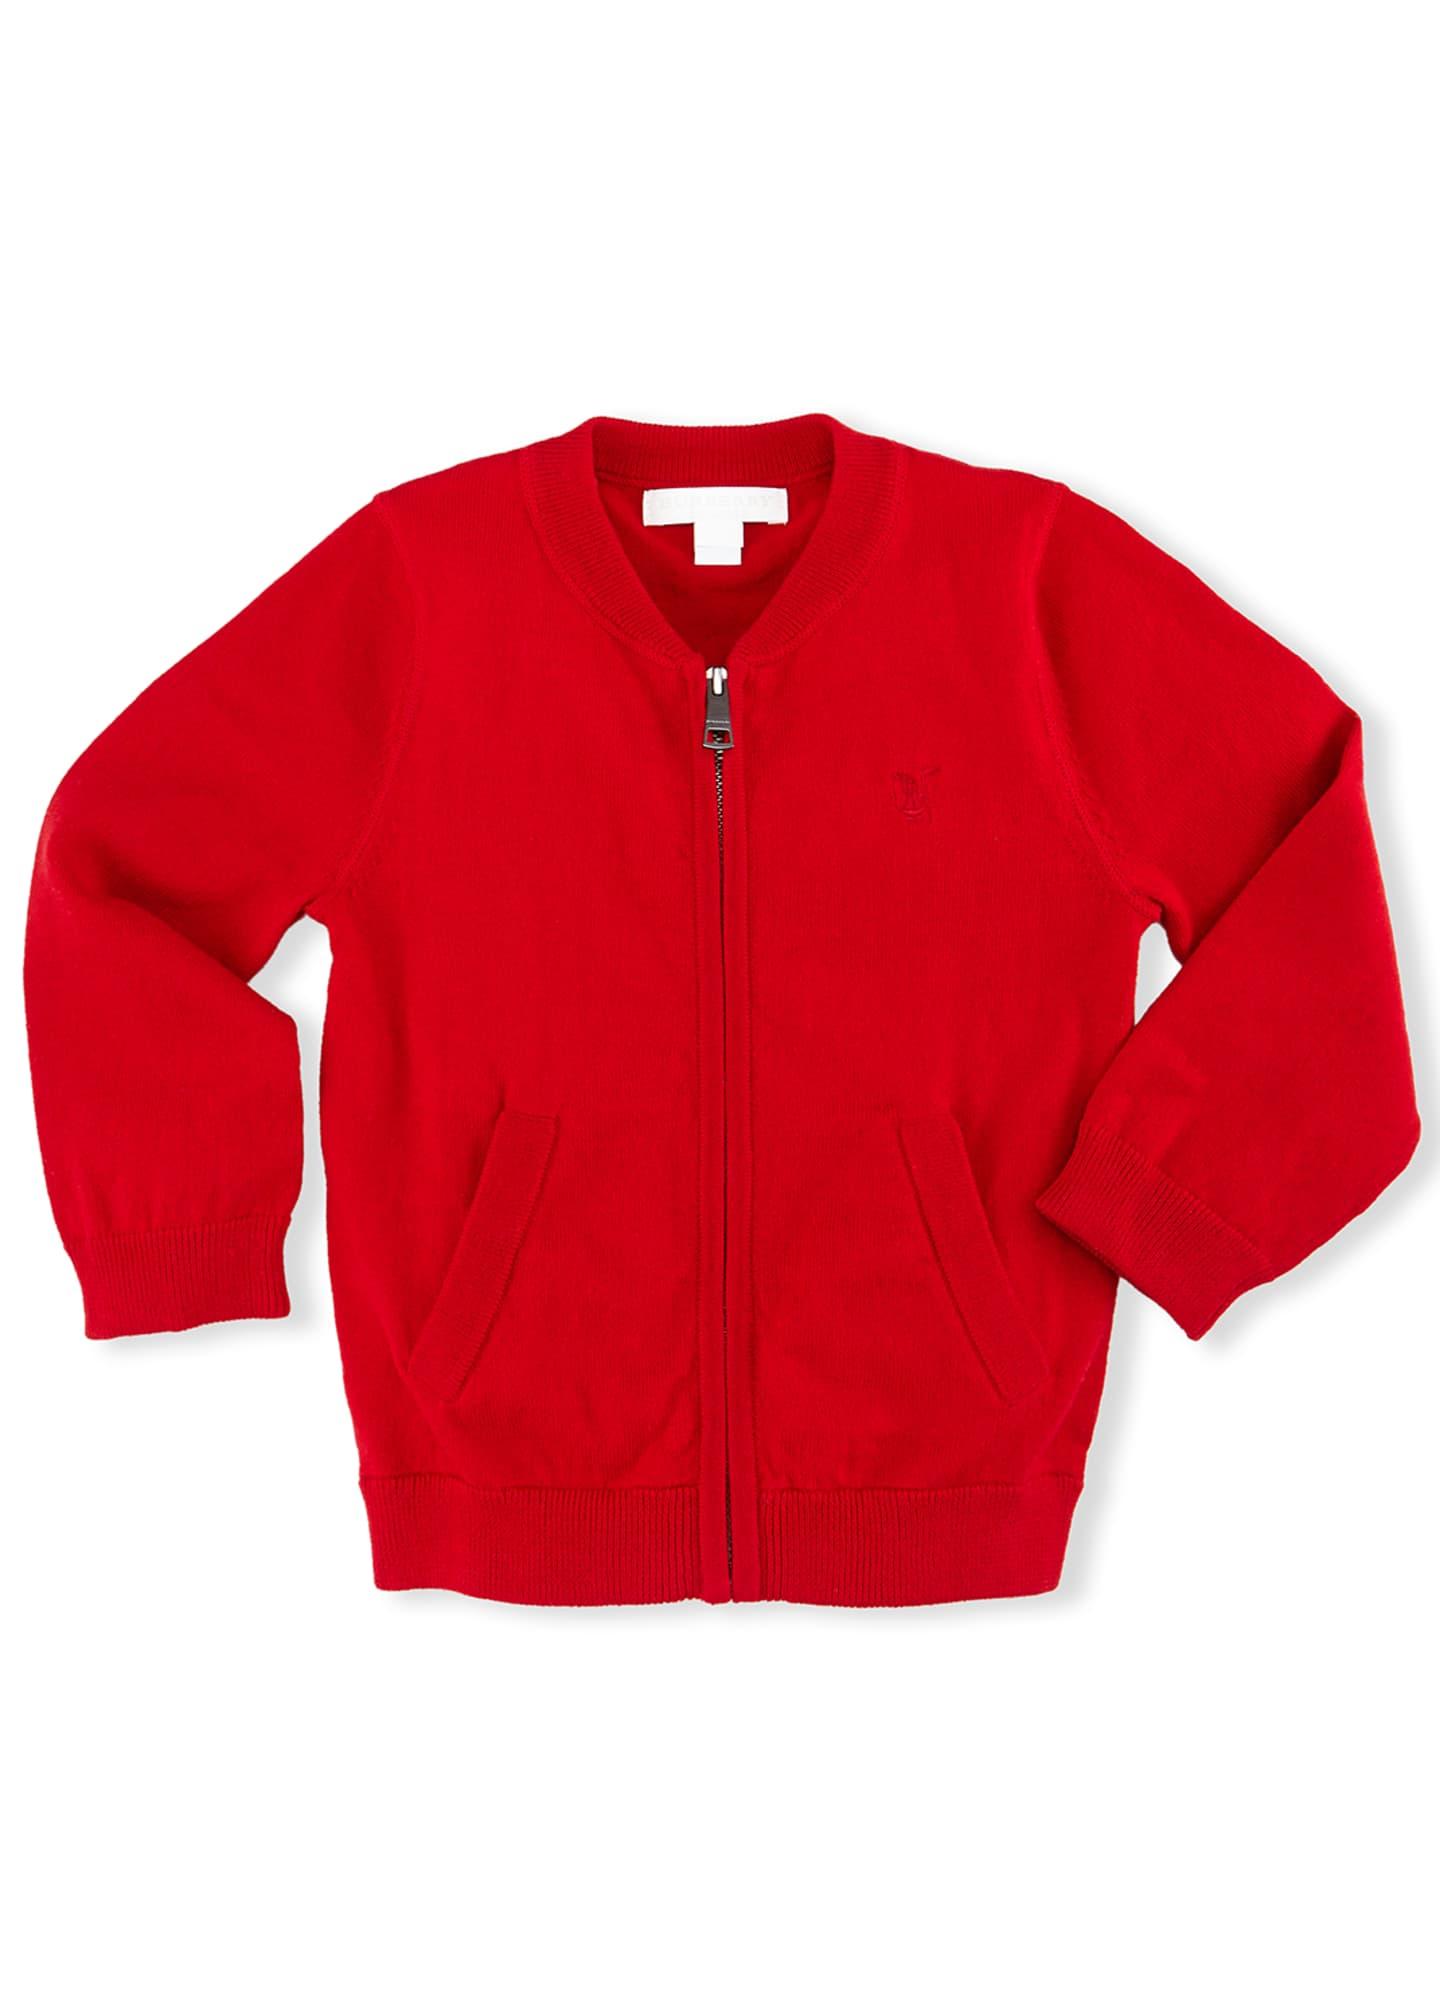 Burberry Jaxson Zip-Front Cotton Cardigan, Red, Size 6M-3